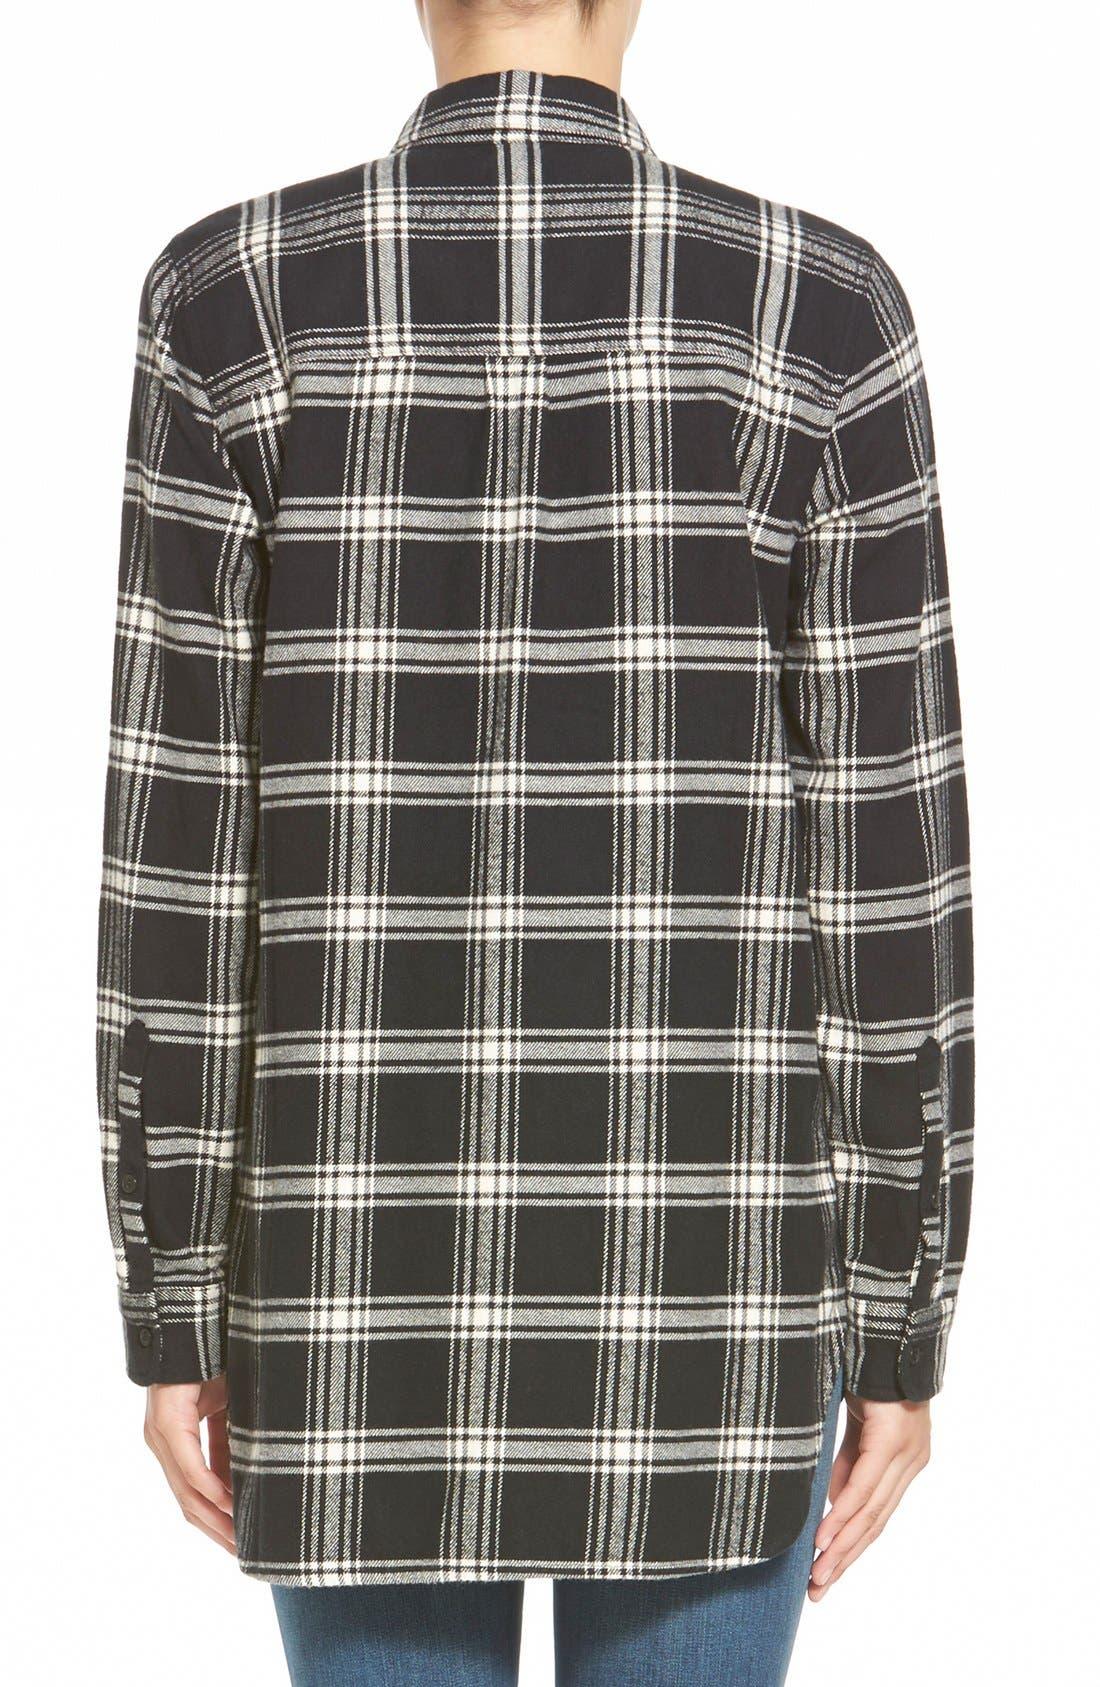 Alternate Image 3  - Madewell'Rutherford Plaid' Flannel Ex-Boyfriend Shirt